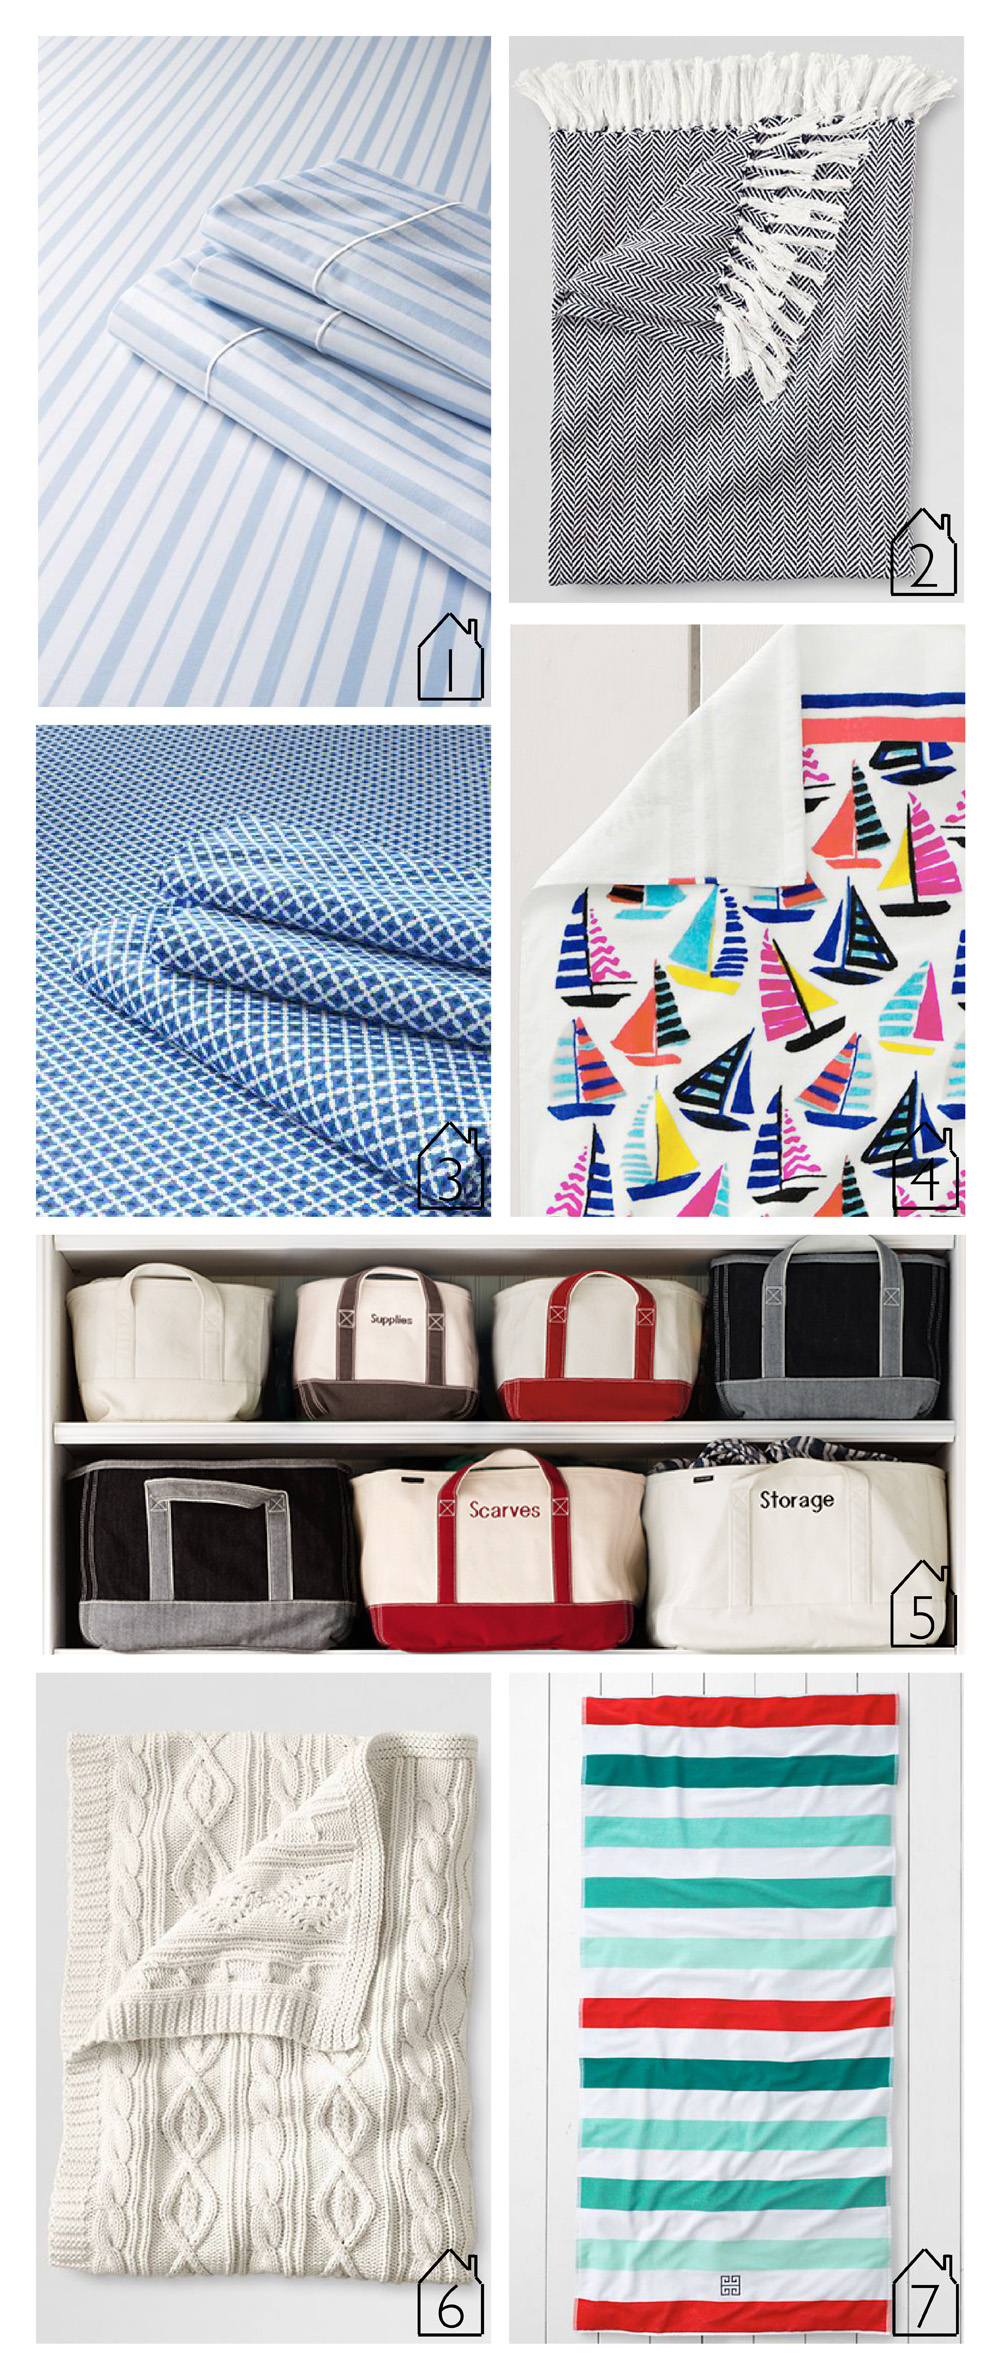 1. 400 Count No Iron Stripe Sheet Set 2. Herringbone Cotton Throw 3. 200 Count Percale Diamond Print Flat Sheet 4. Sailboats Beach Towel 5. Canvas Storage 6. Lakeland Cotton Cable Throw 7. Classic Stripe Beach Towel